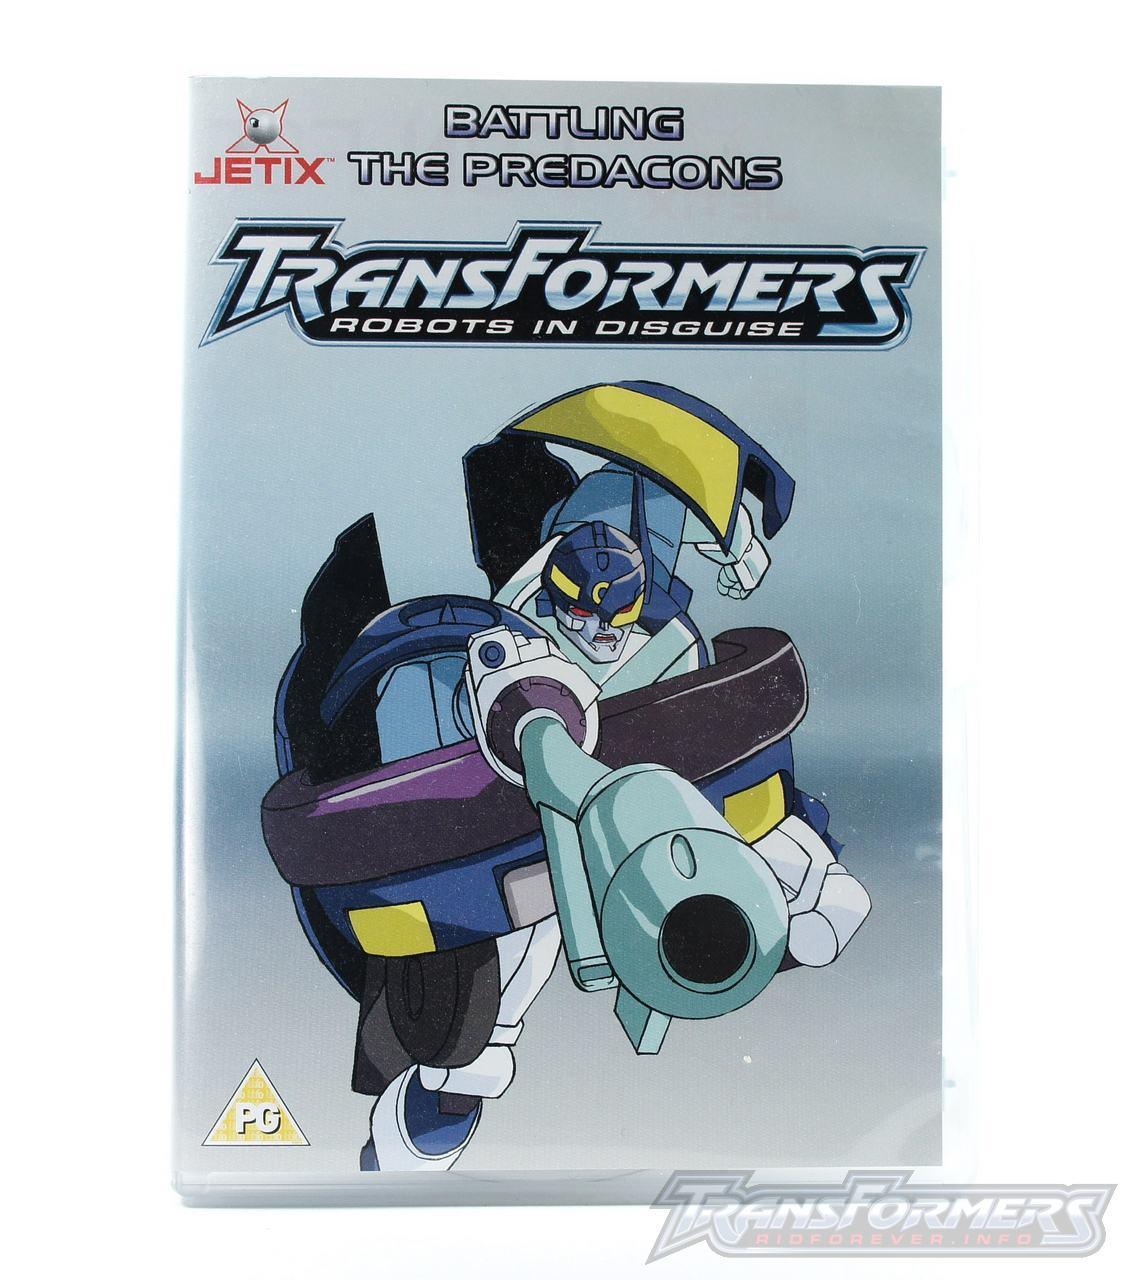 rid-uk-dvd-battling-predacons-front